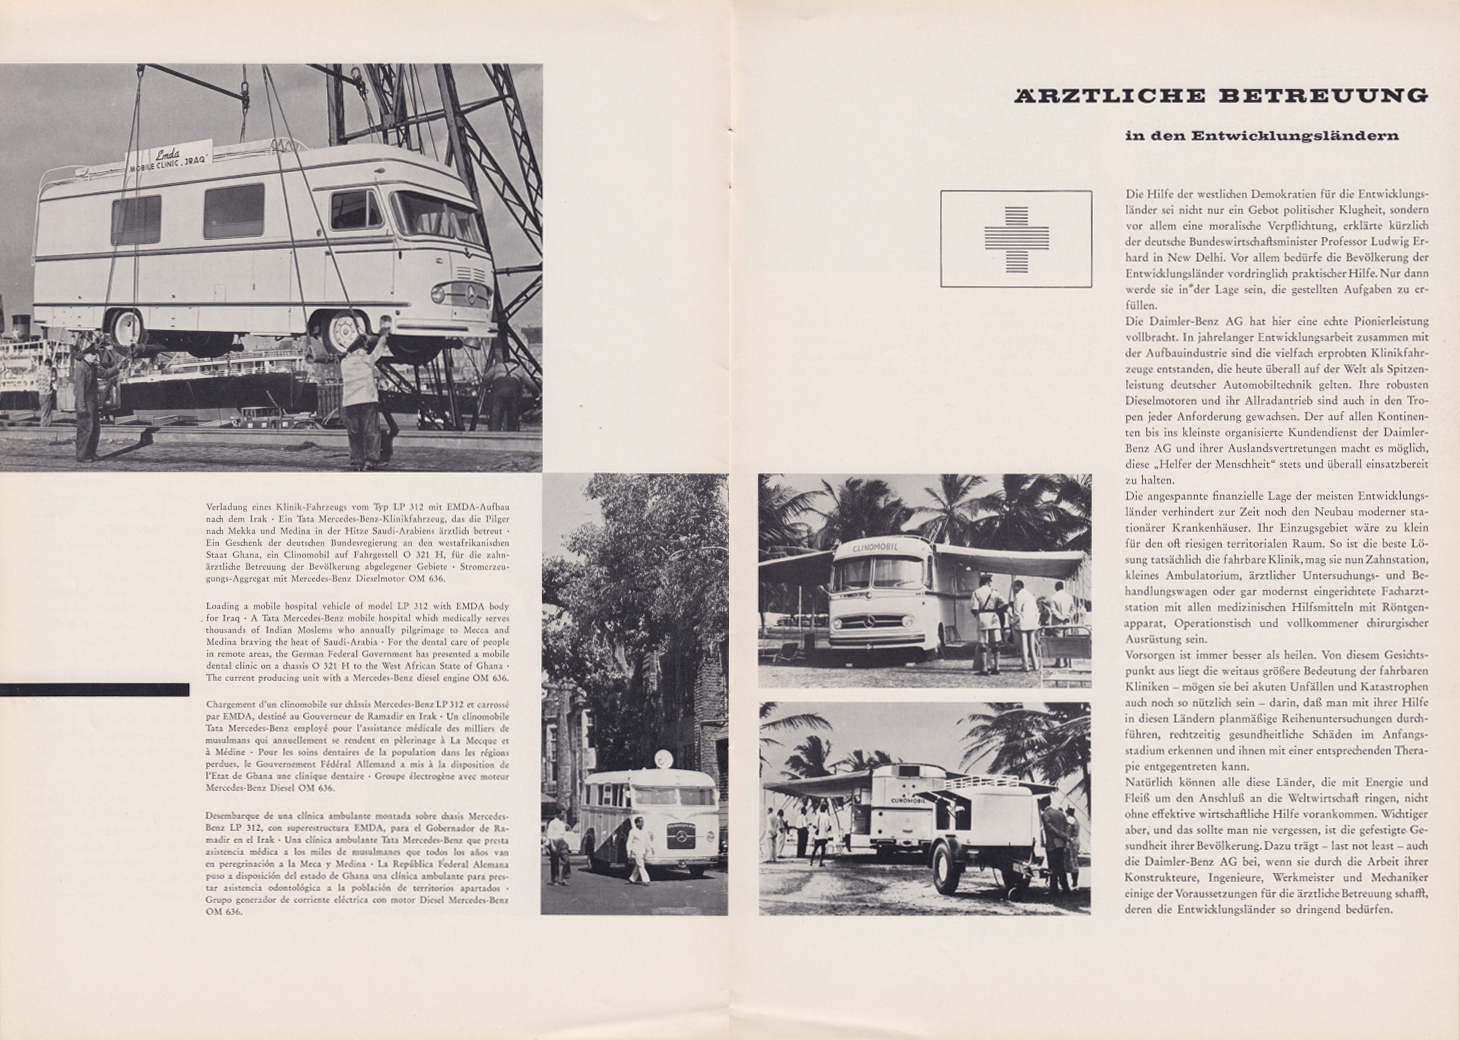 (REVISTA): Periódico In aller welt n.º 29 - Mercedes-Benz no mundo - 1959 - multilingue 006